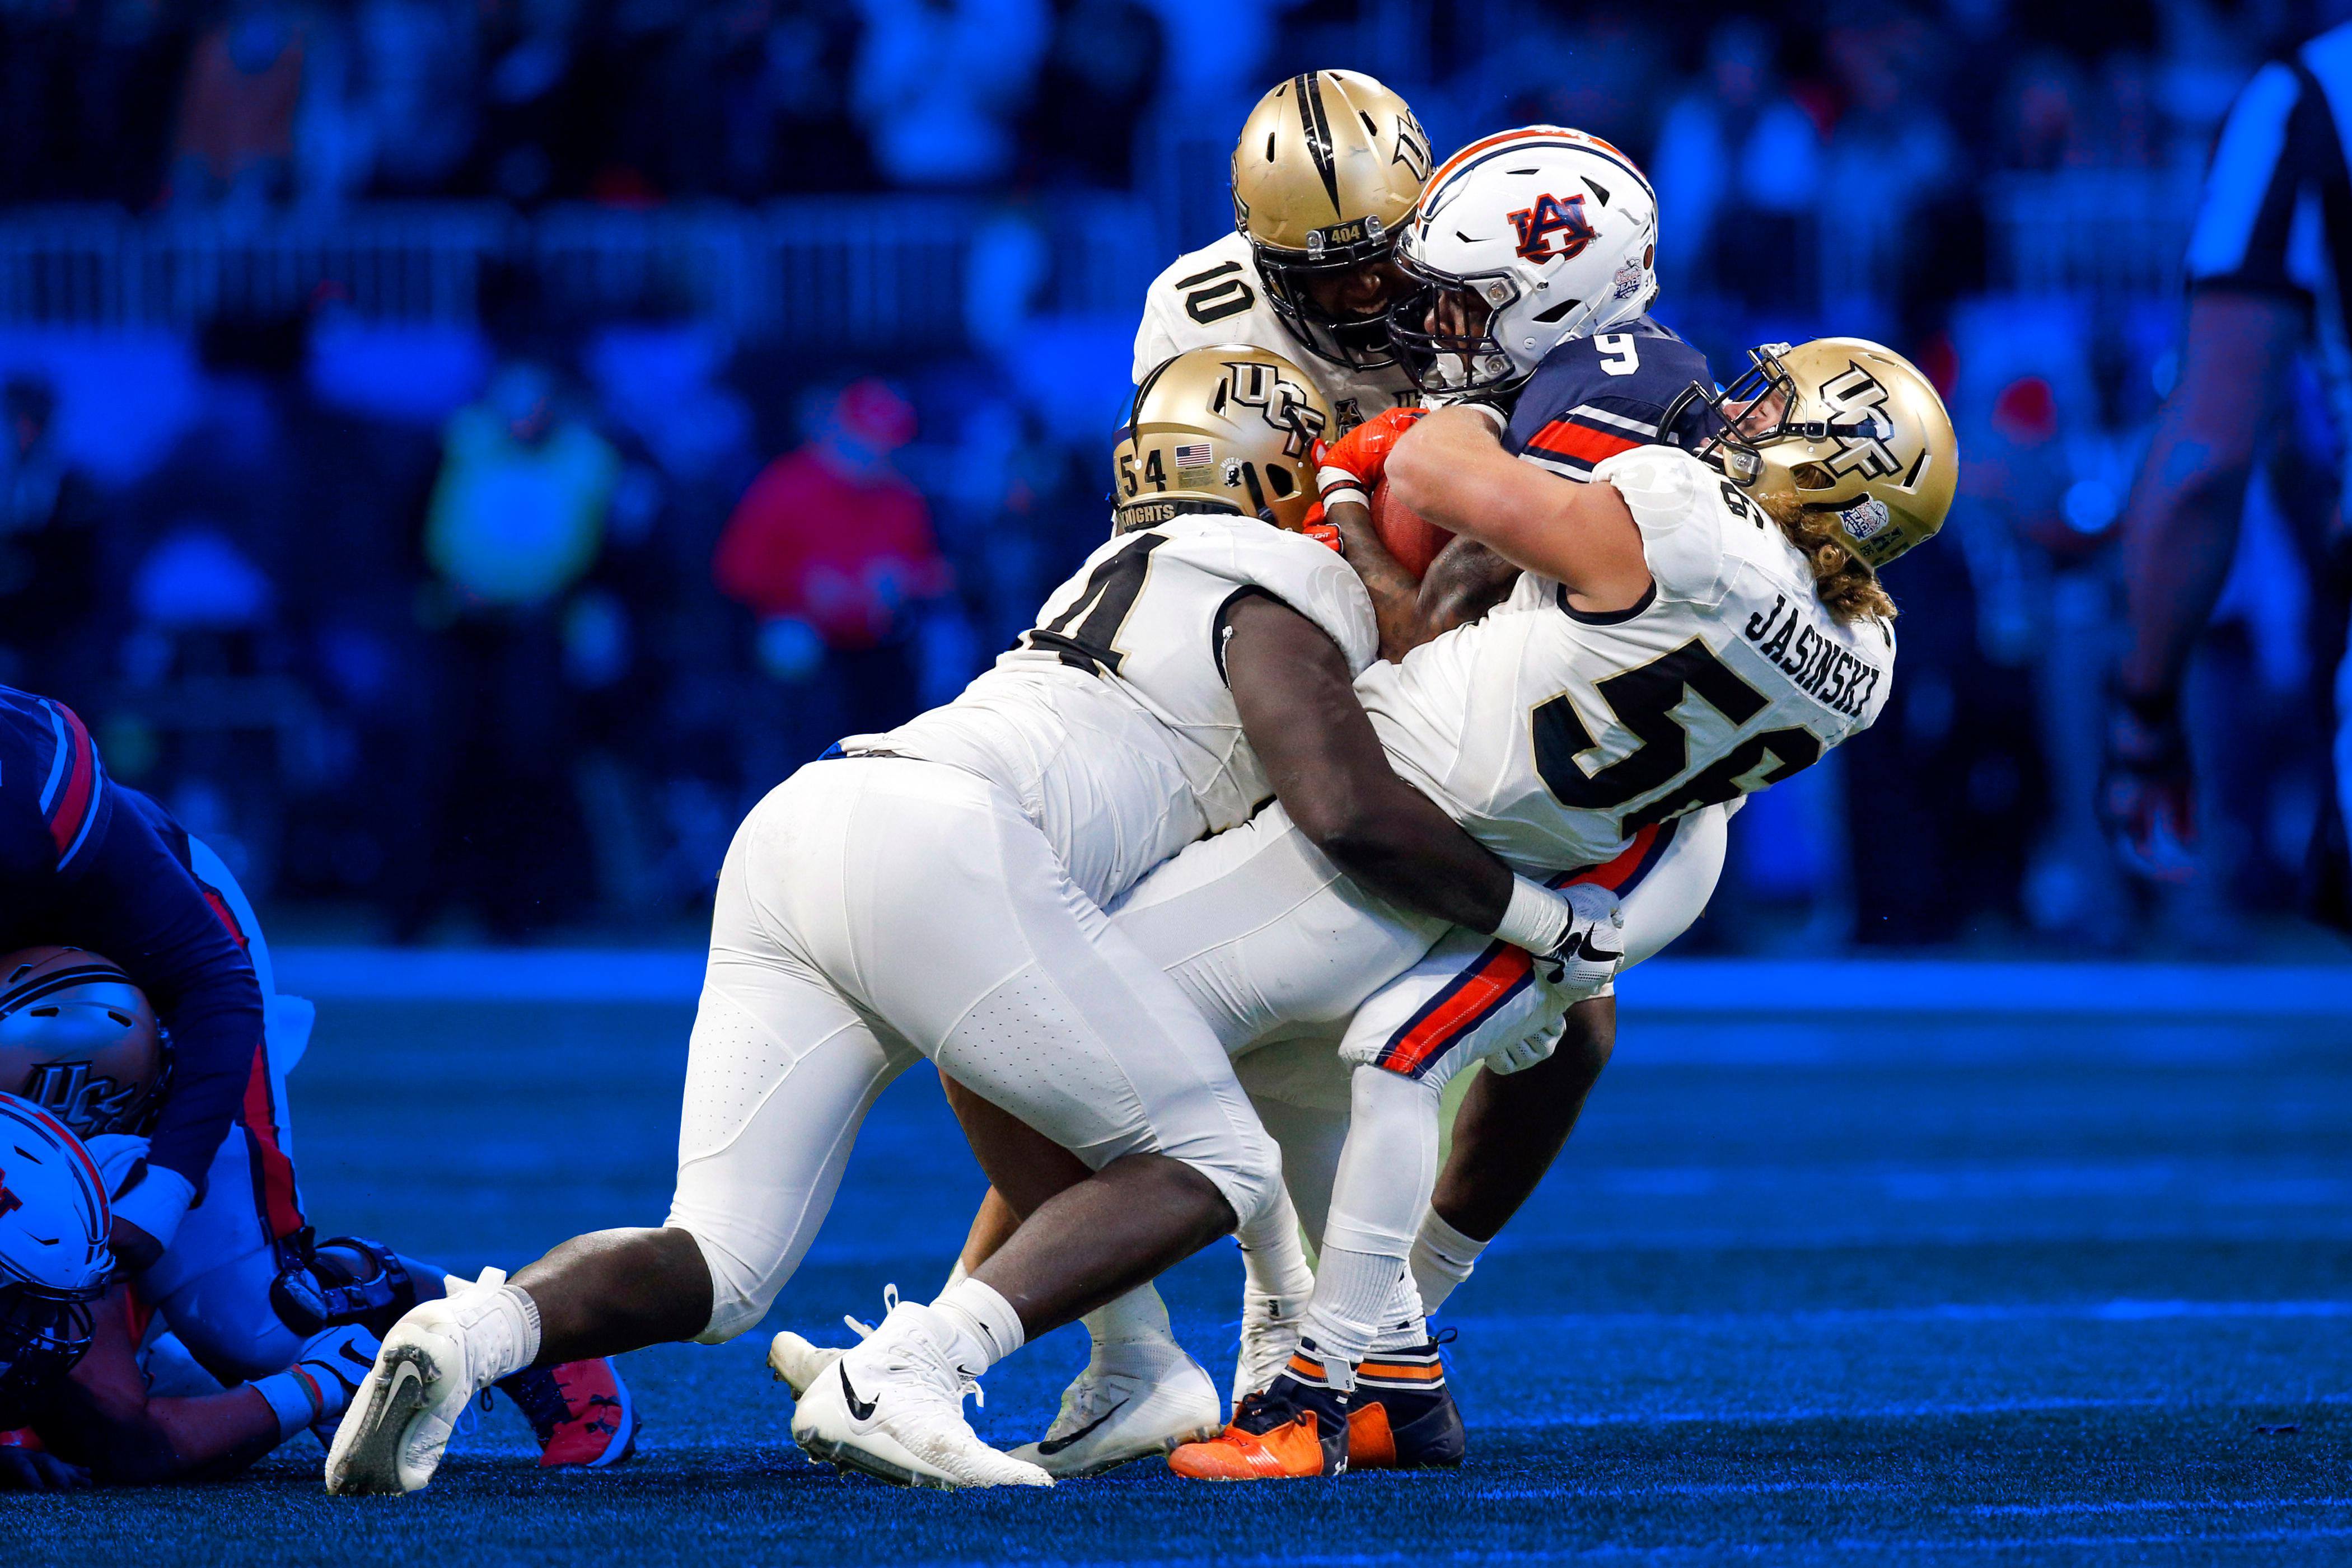 UCF vs. Auburn Peach Bowl tackle